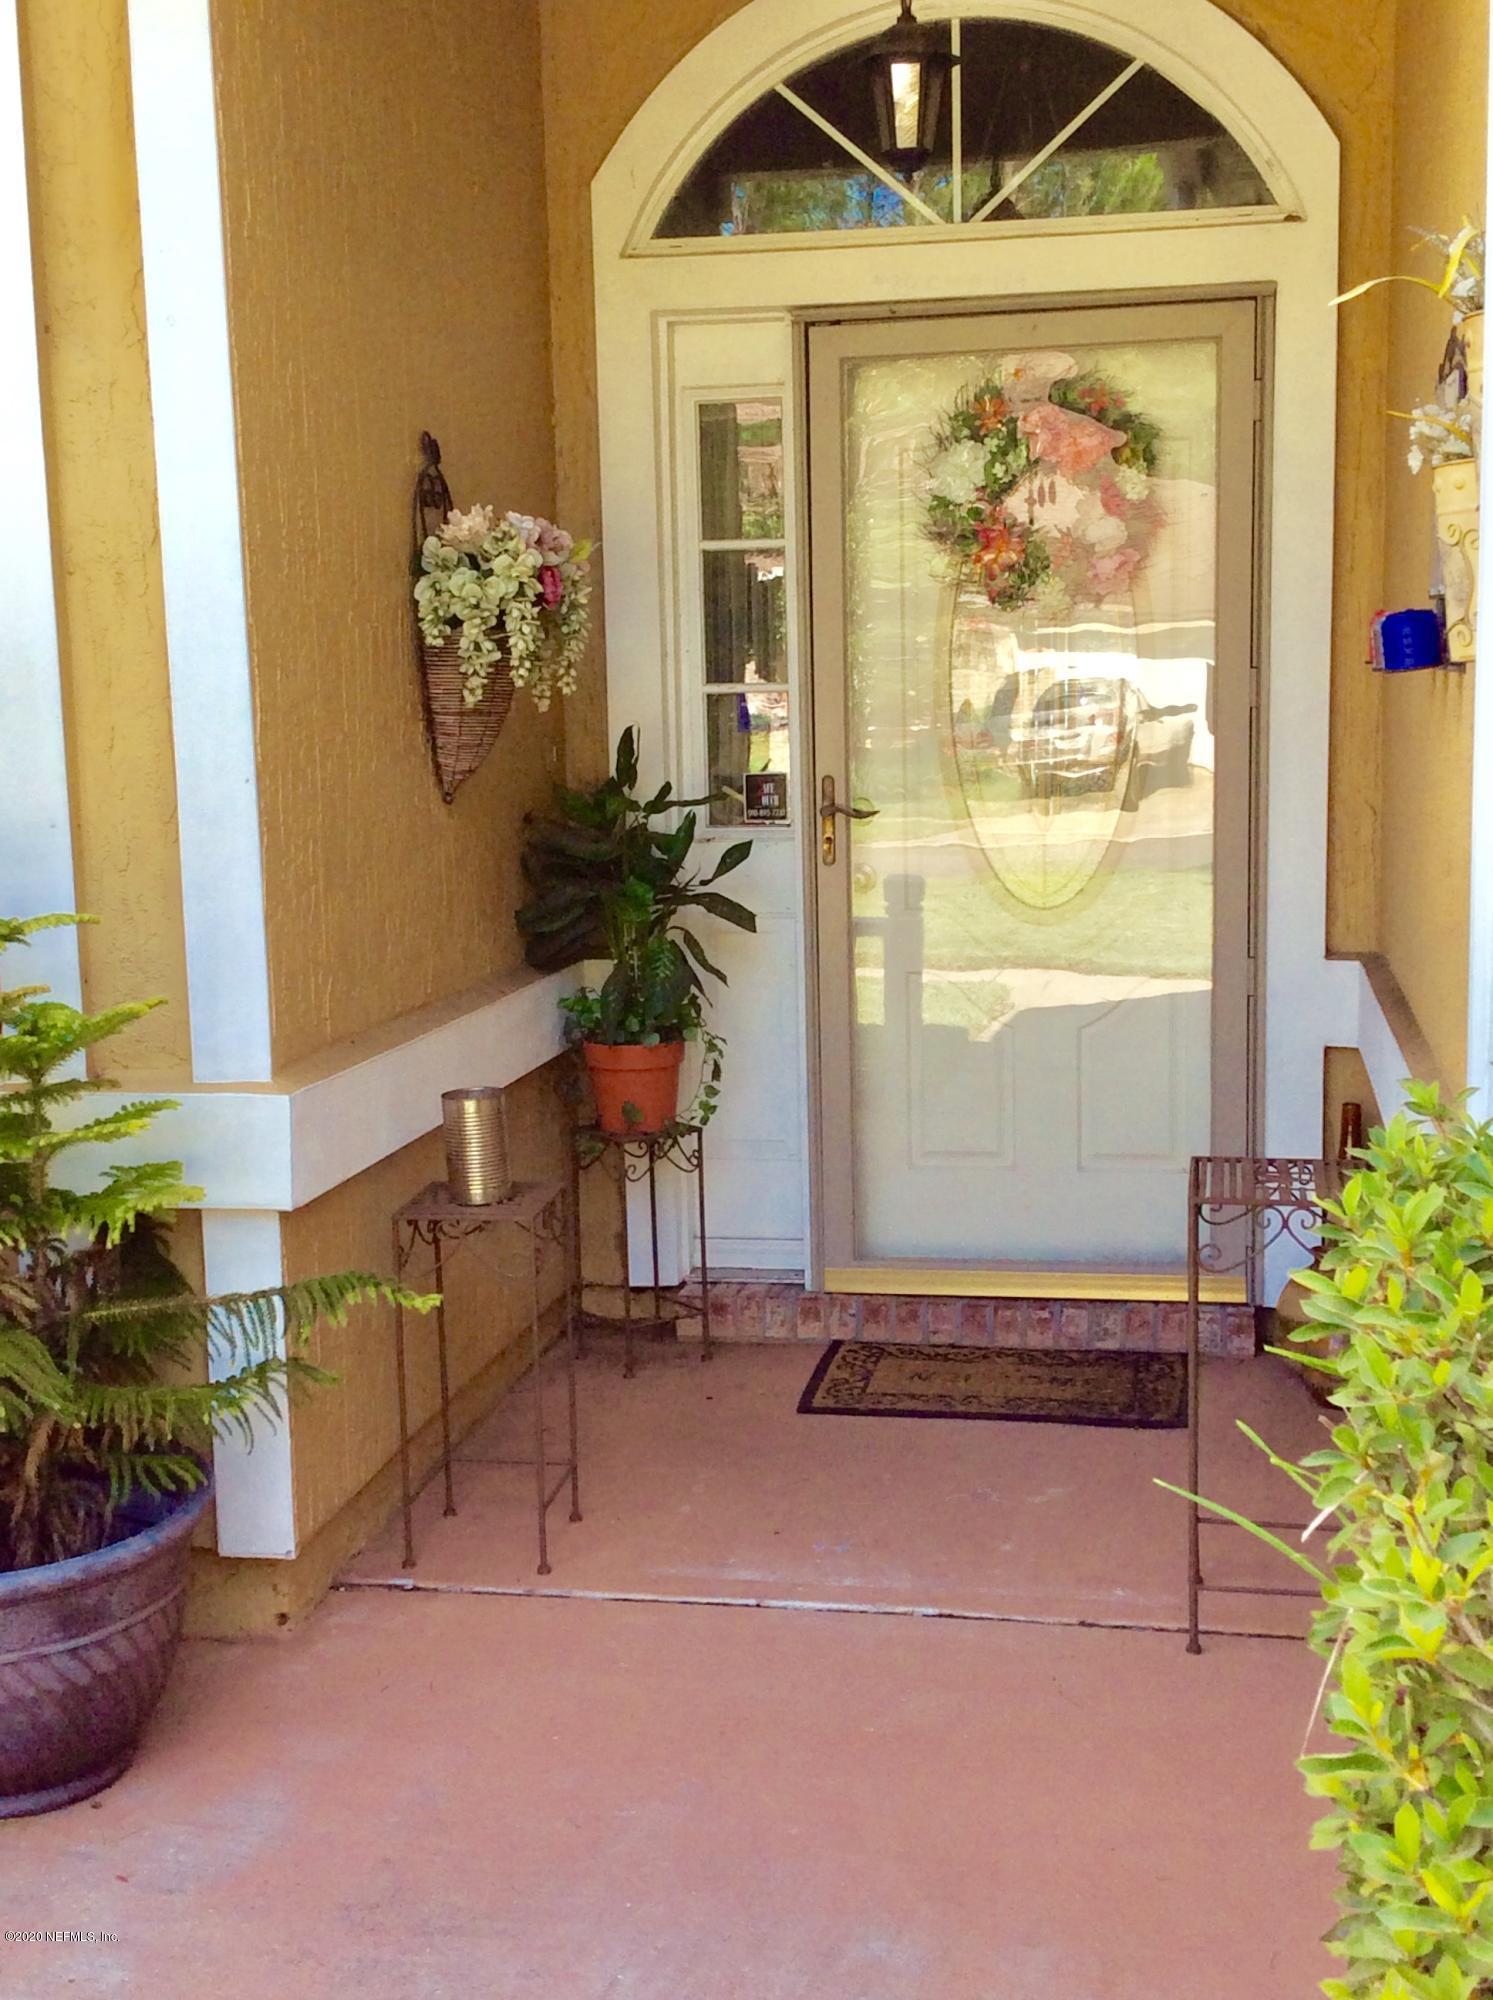 1938 KNOTTINGHAM TRACE, JACKSONVILLE, FLORIDA 32246, 4 Bedrooms Bedrooms, ,2 BathroomsBathrooms,Residential,For sale,KNOTTINGHAM TRACE,1066170